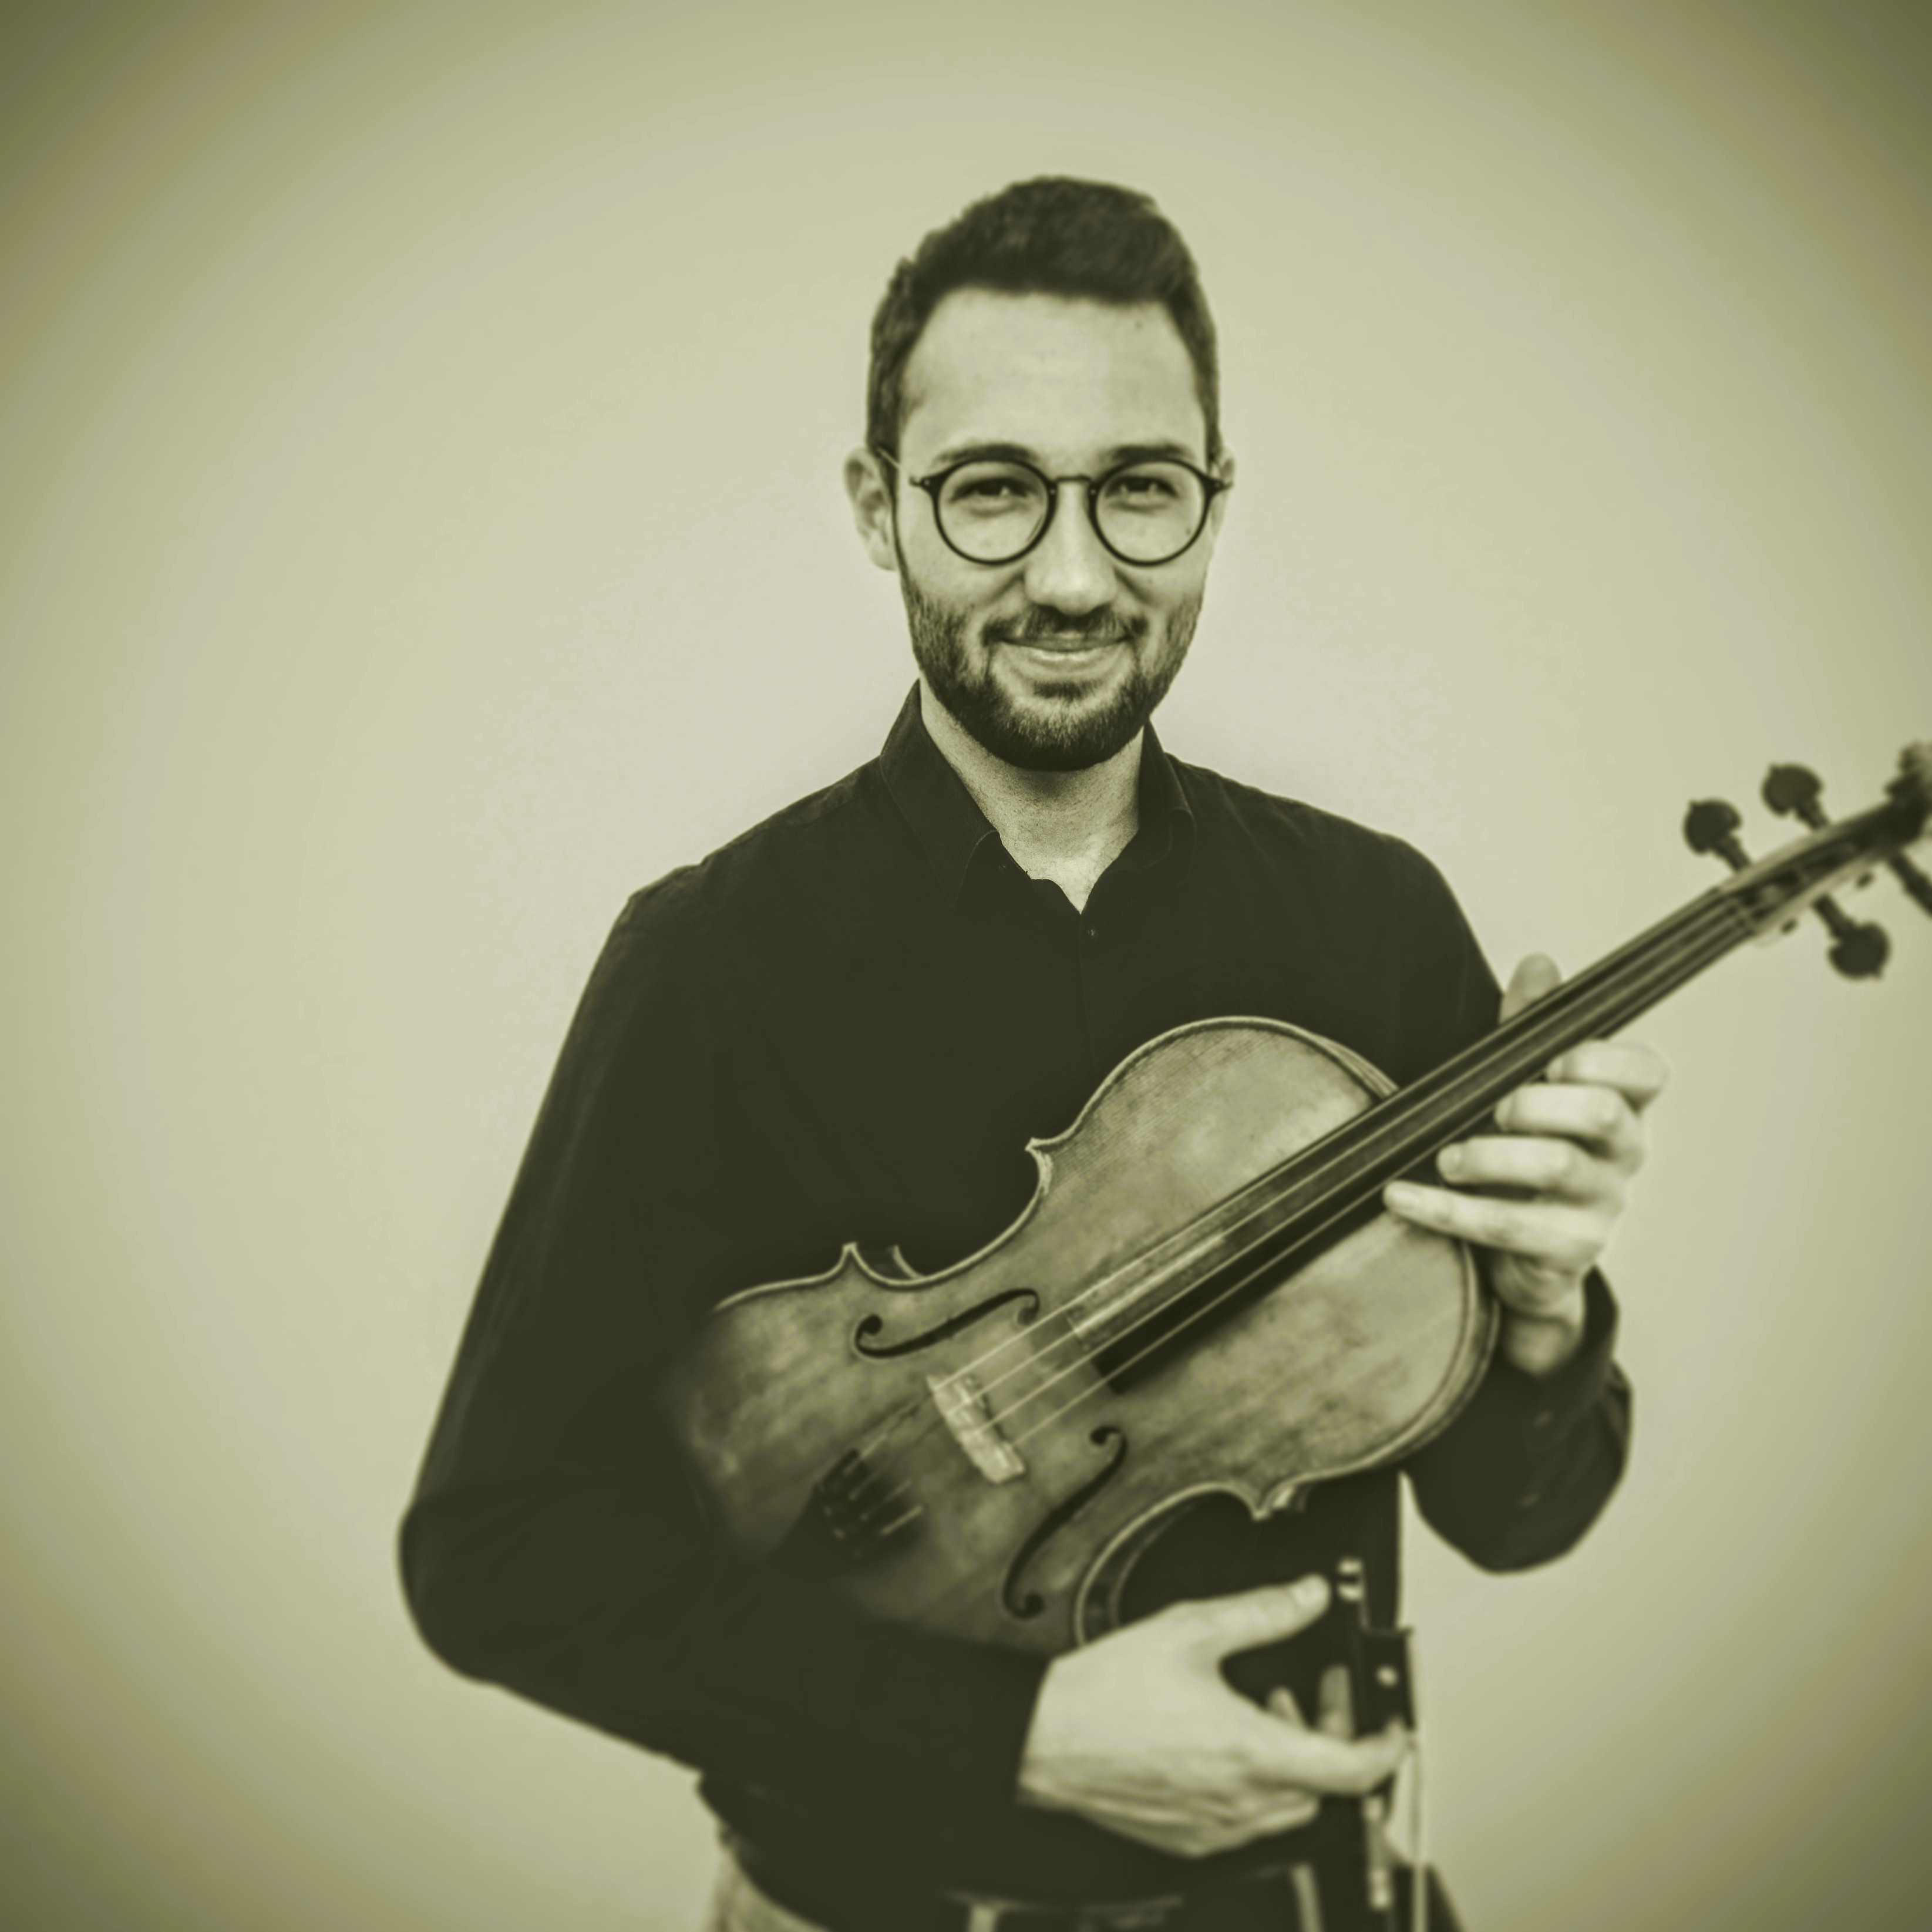 Javier Cubillas